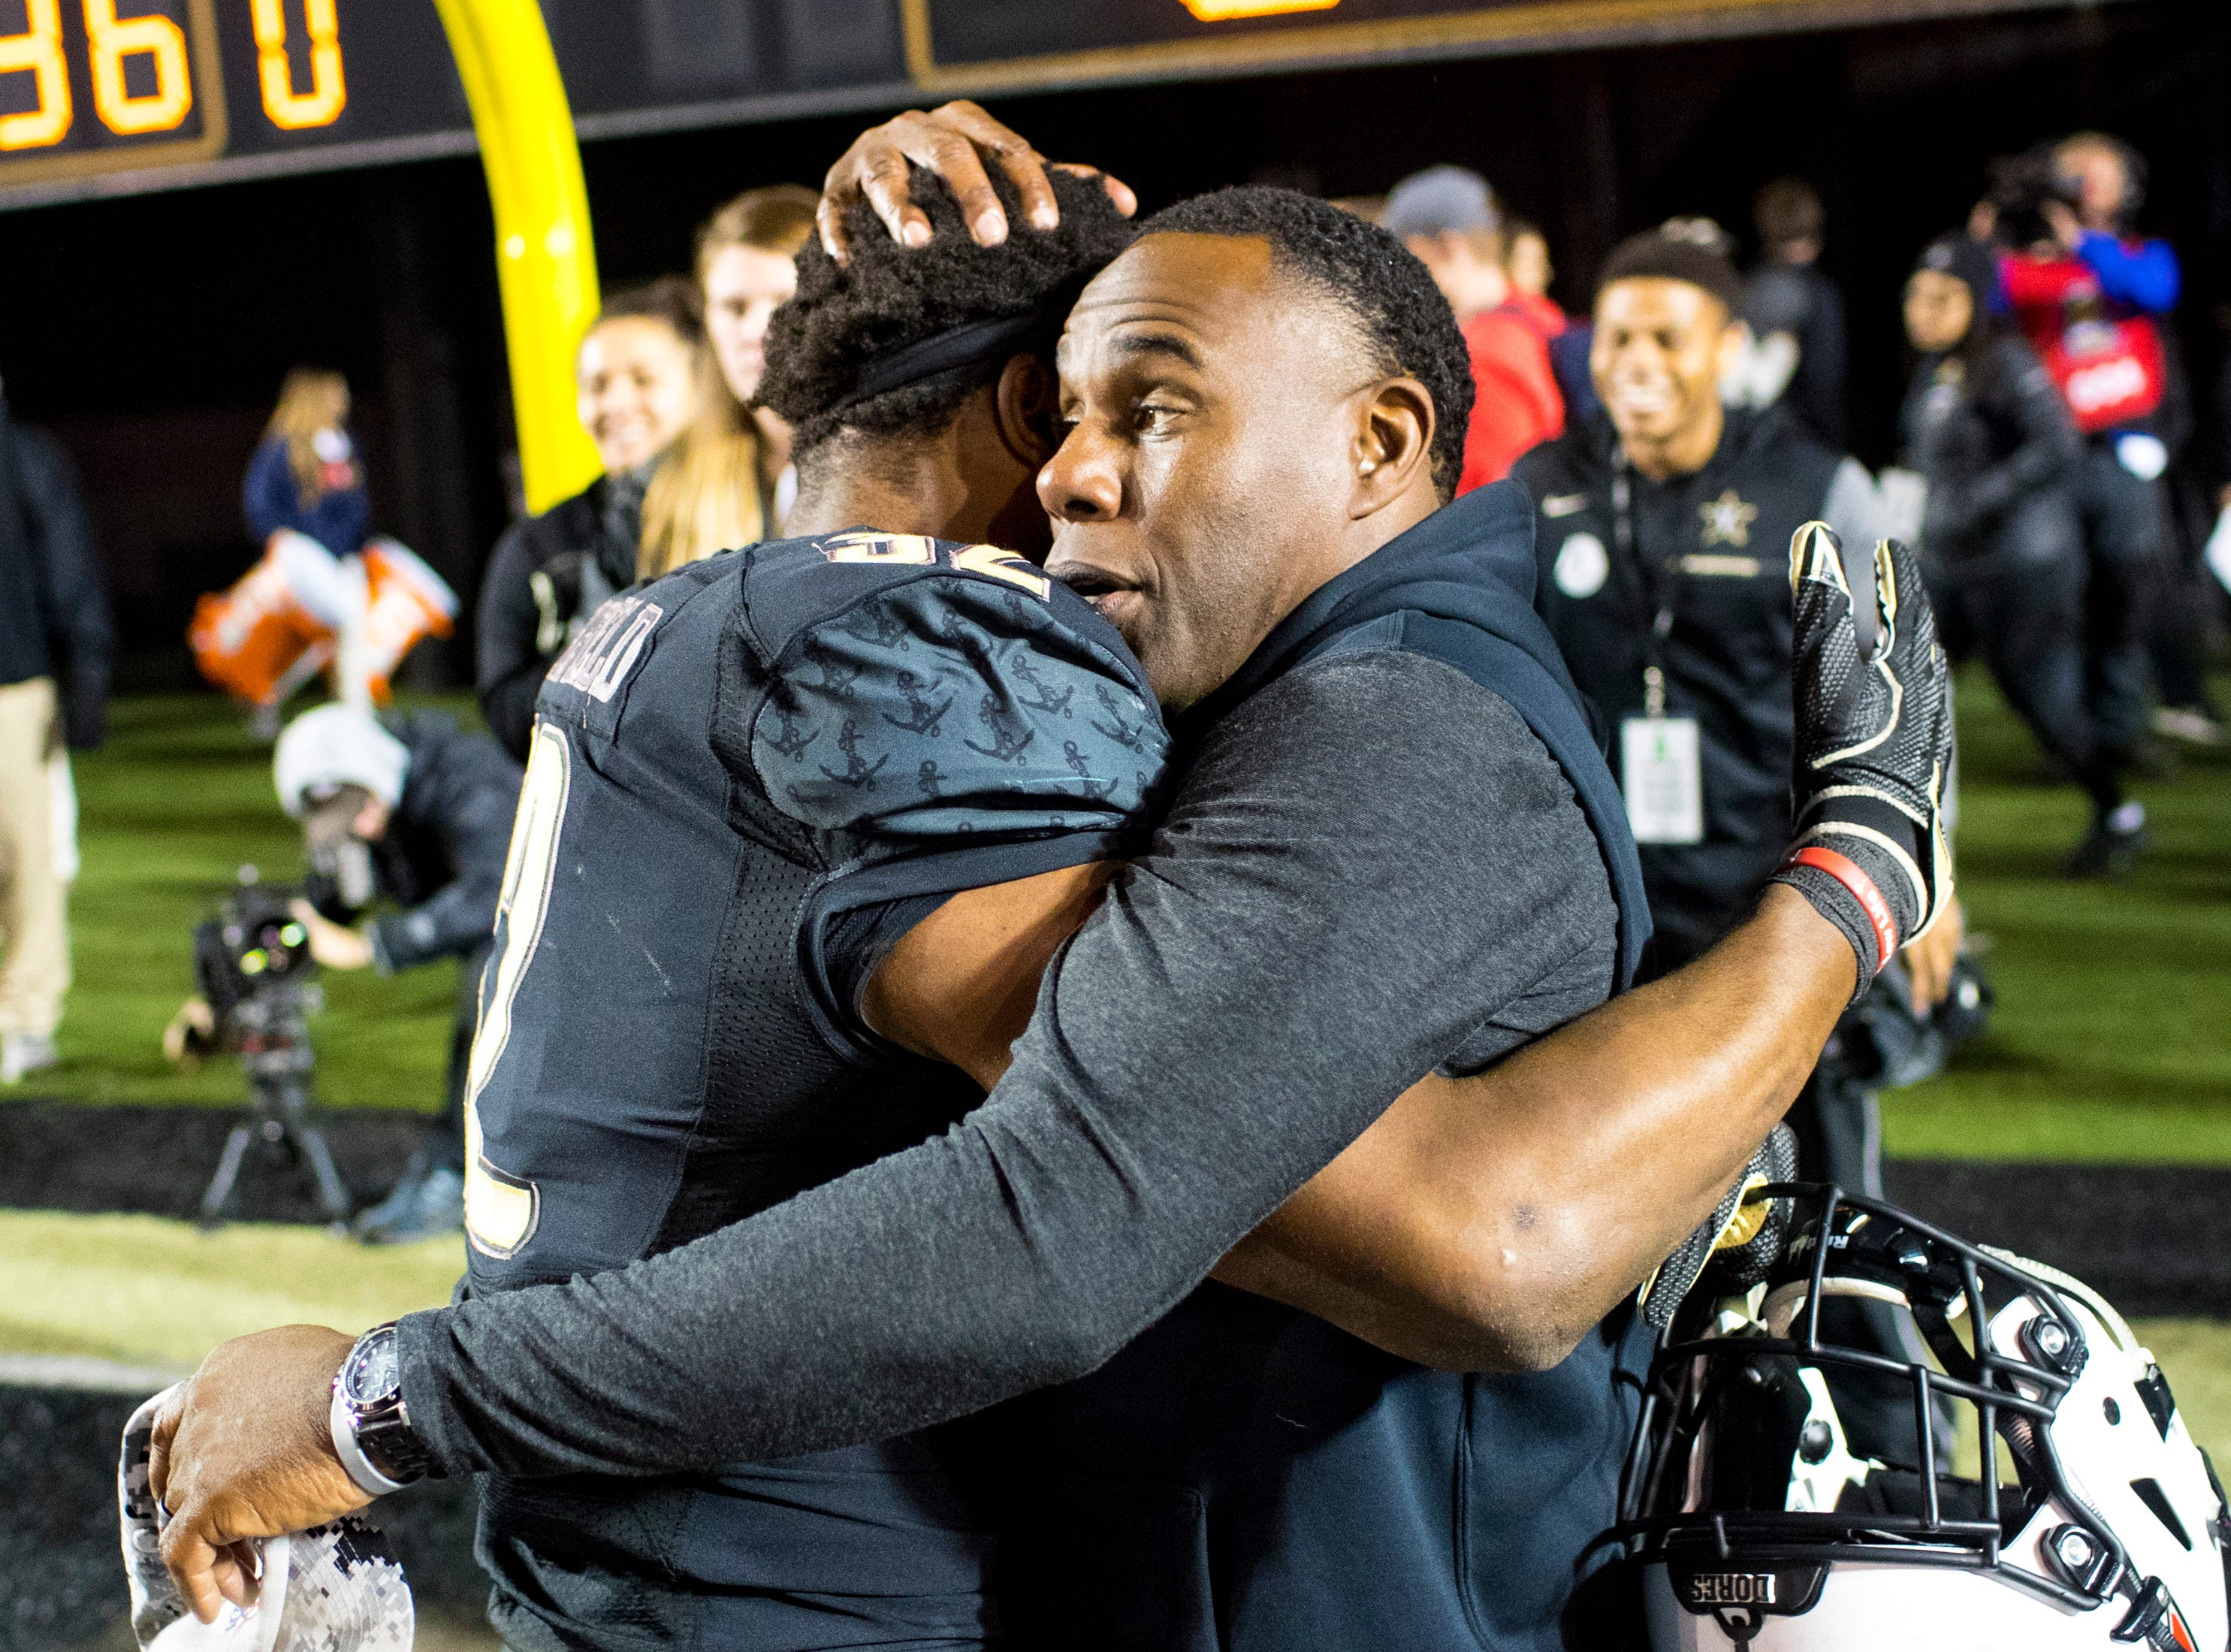 Vanderbilt head coach Derek Mason hugs Vanderbilt running back Jamauri Wakefield (32) after Vanderbilt's game against Ole Miss at Vanderbilt Stadium in Nashville on Saturday, Nov. 17, 2018.